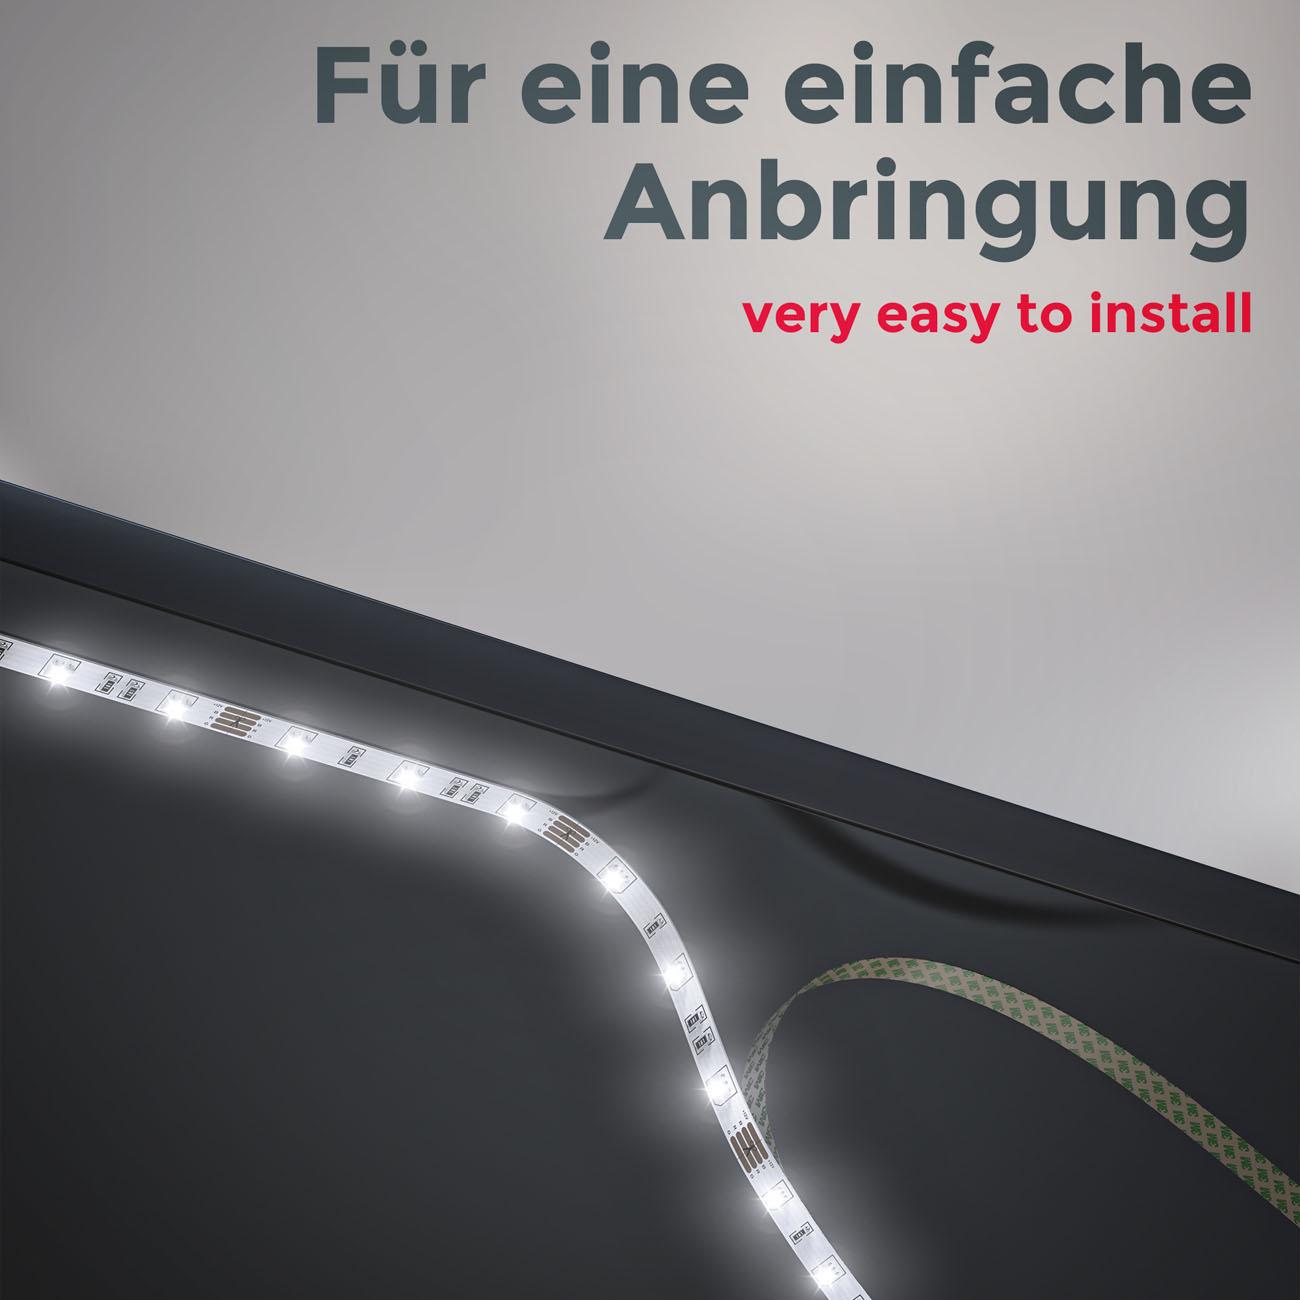 RGB LED Streifen mit Farbwechsel 3m - 8